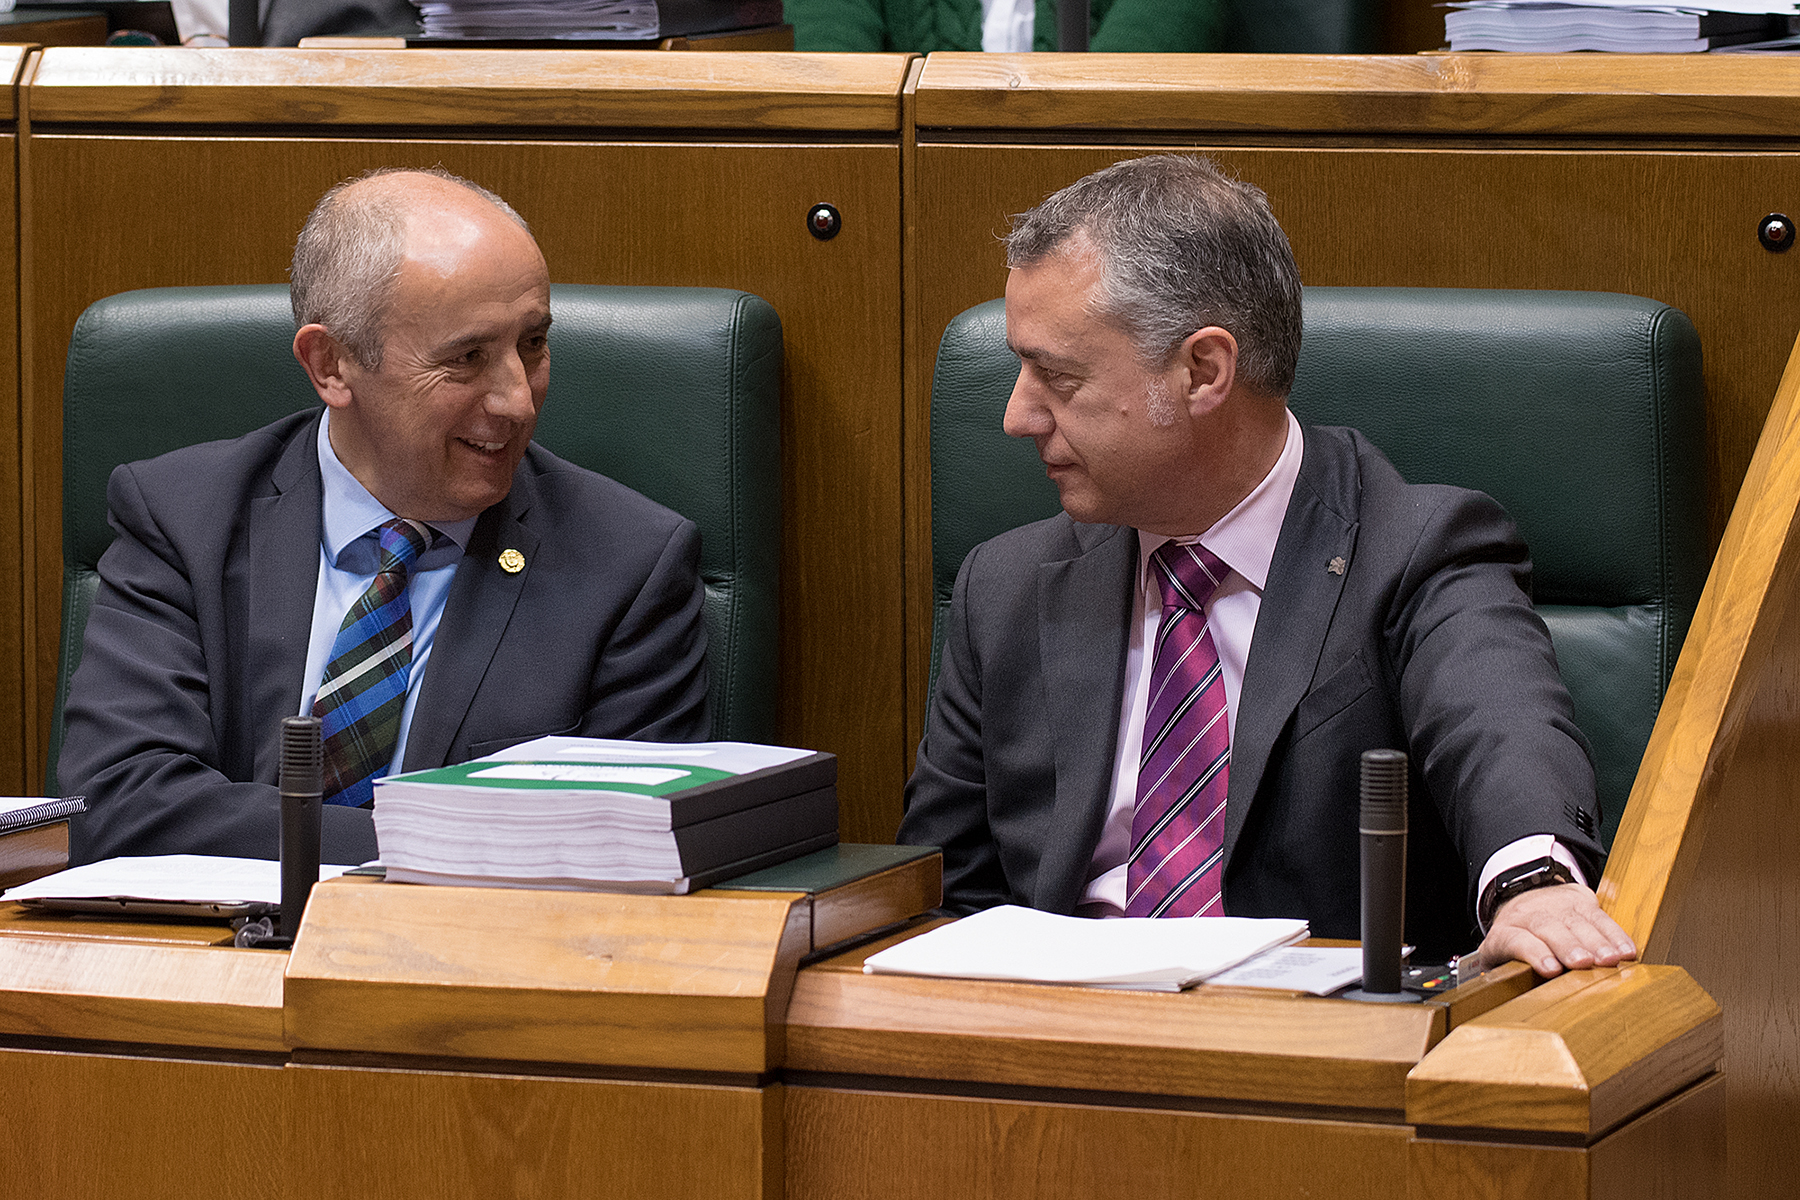 2016_04_07_lhk_parlamento_216.jpg